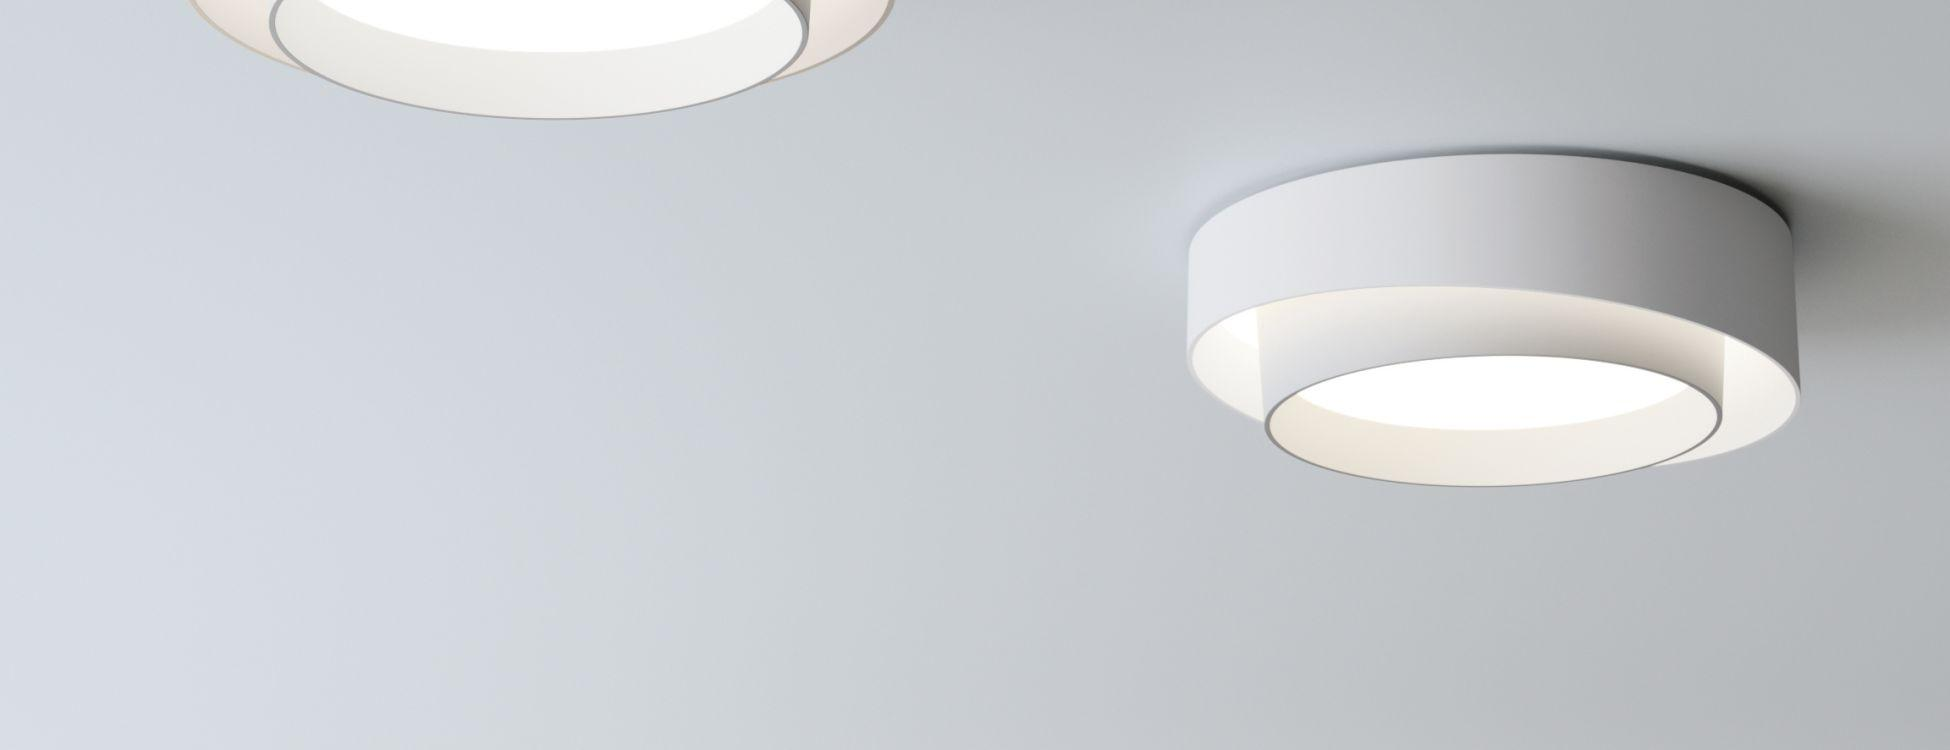 Centric lâmpada do teto ø32cm (6cm) 1xLED 15,2W + 2xLED 4W dimmable - Lacado branco fosco